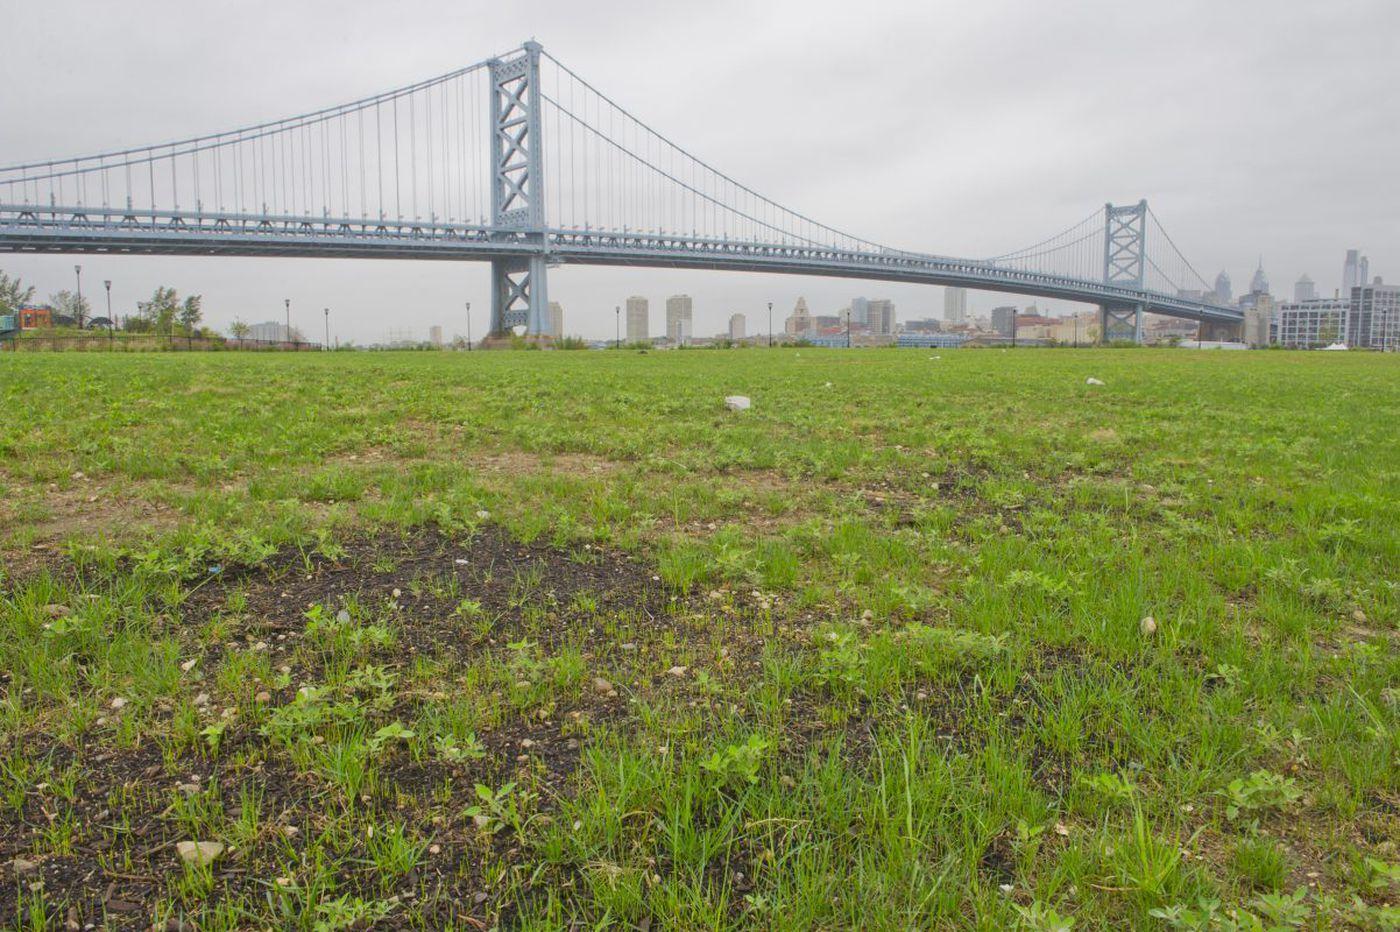 Camden undaunted on Amazon headquarters bid, as N.J. backs Newark